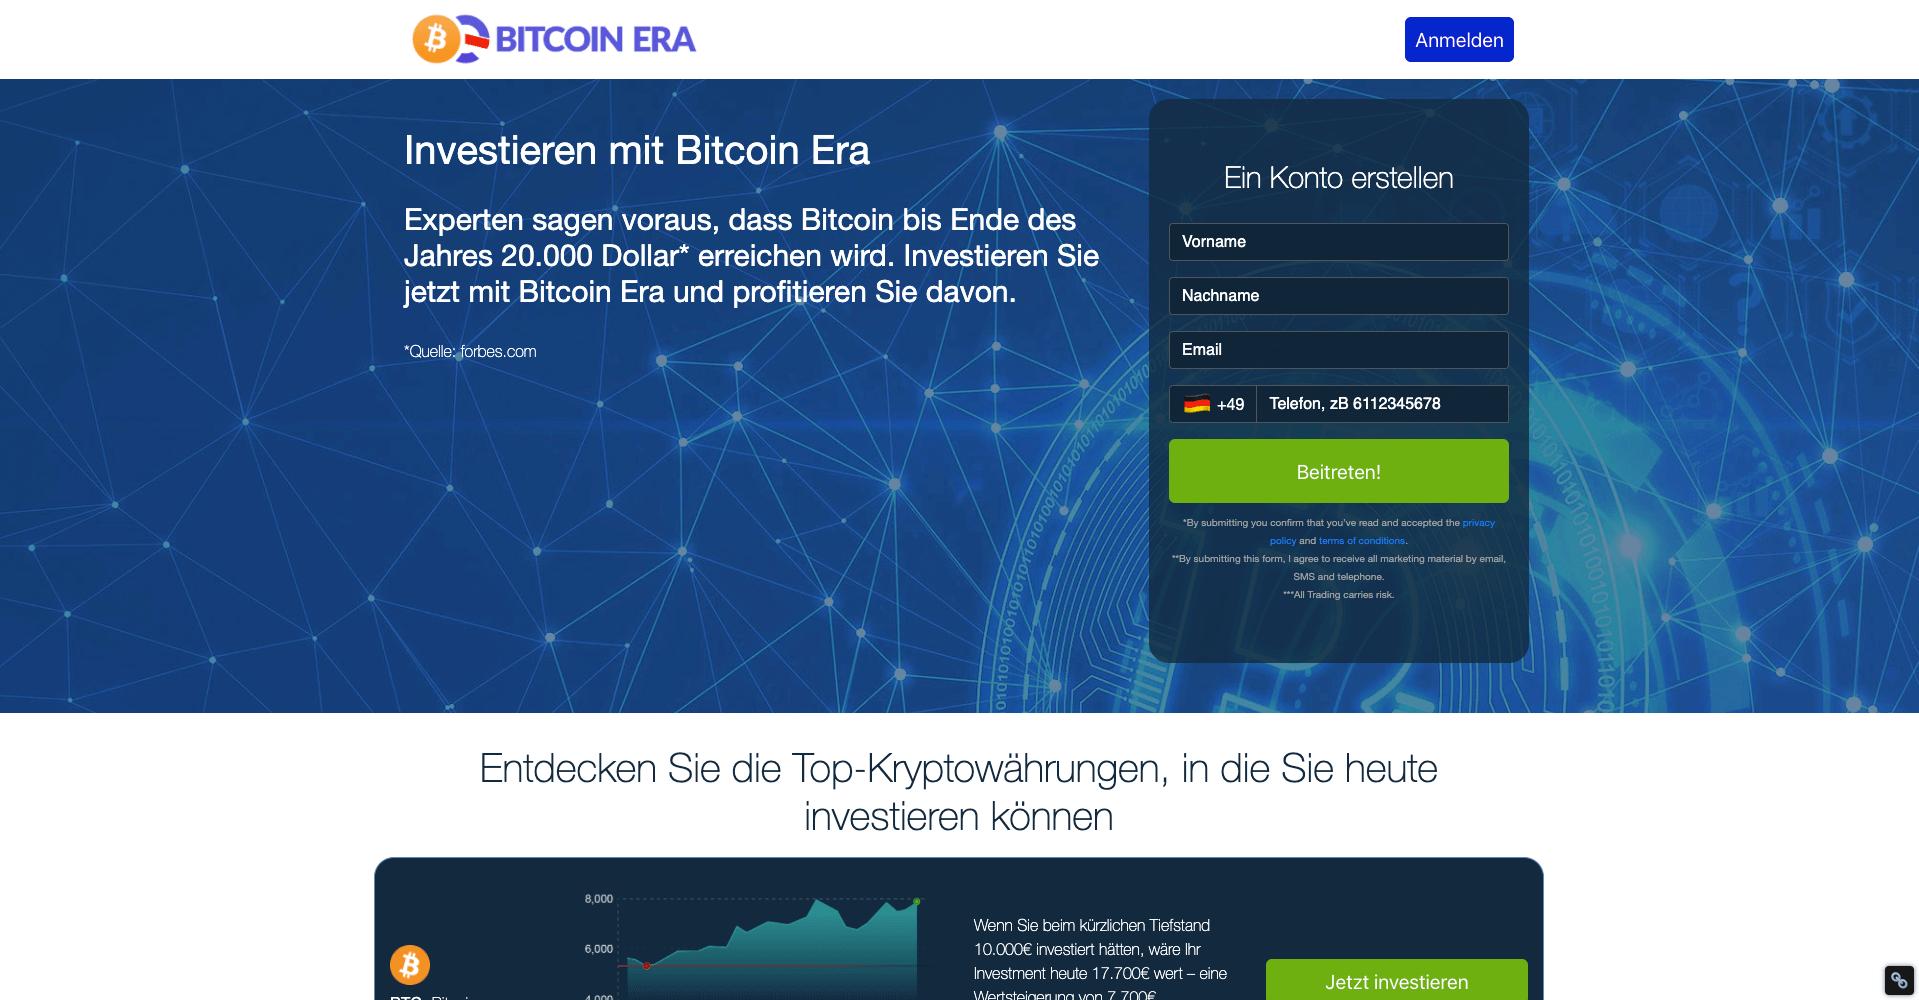 aktienhandel roboter software überprüfung handelskugel bitcoin